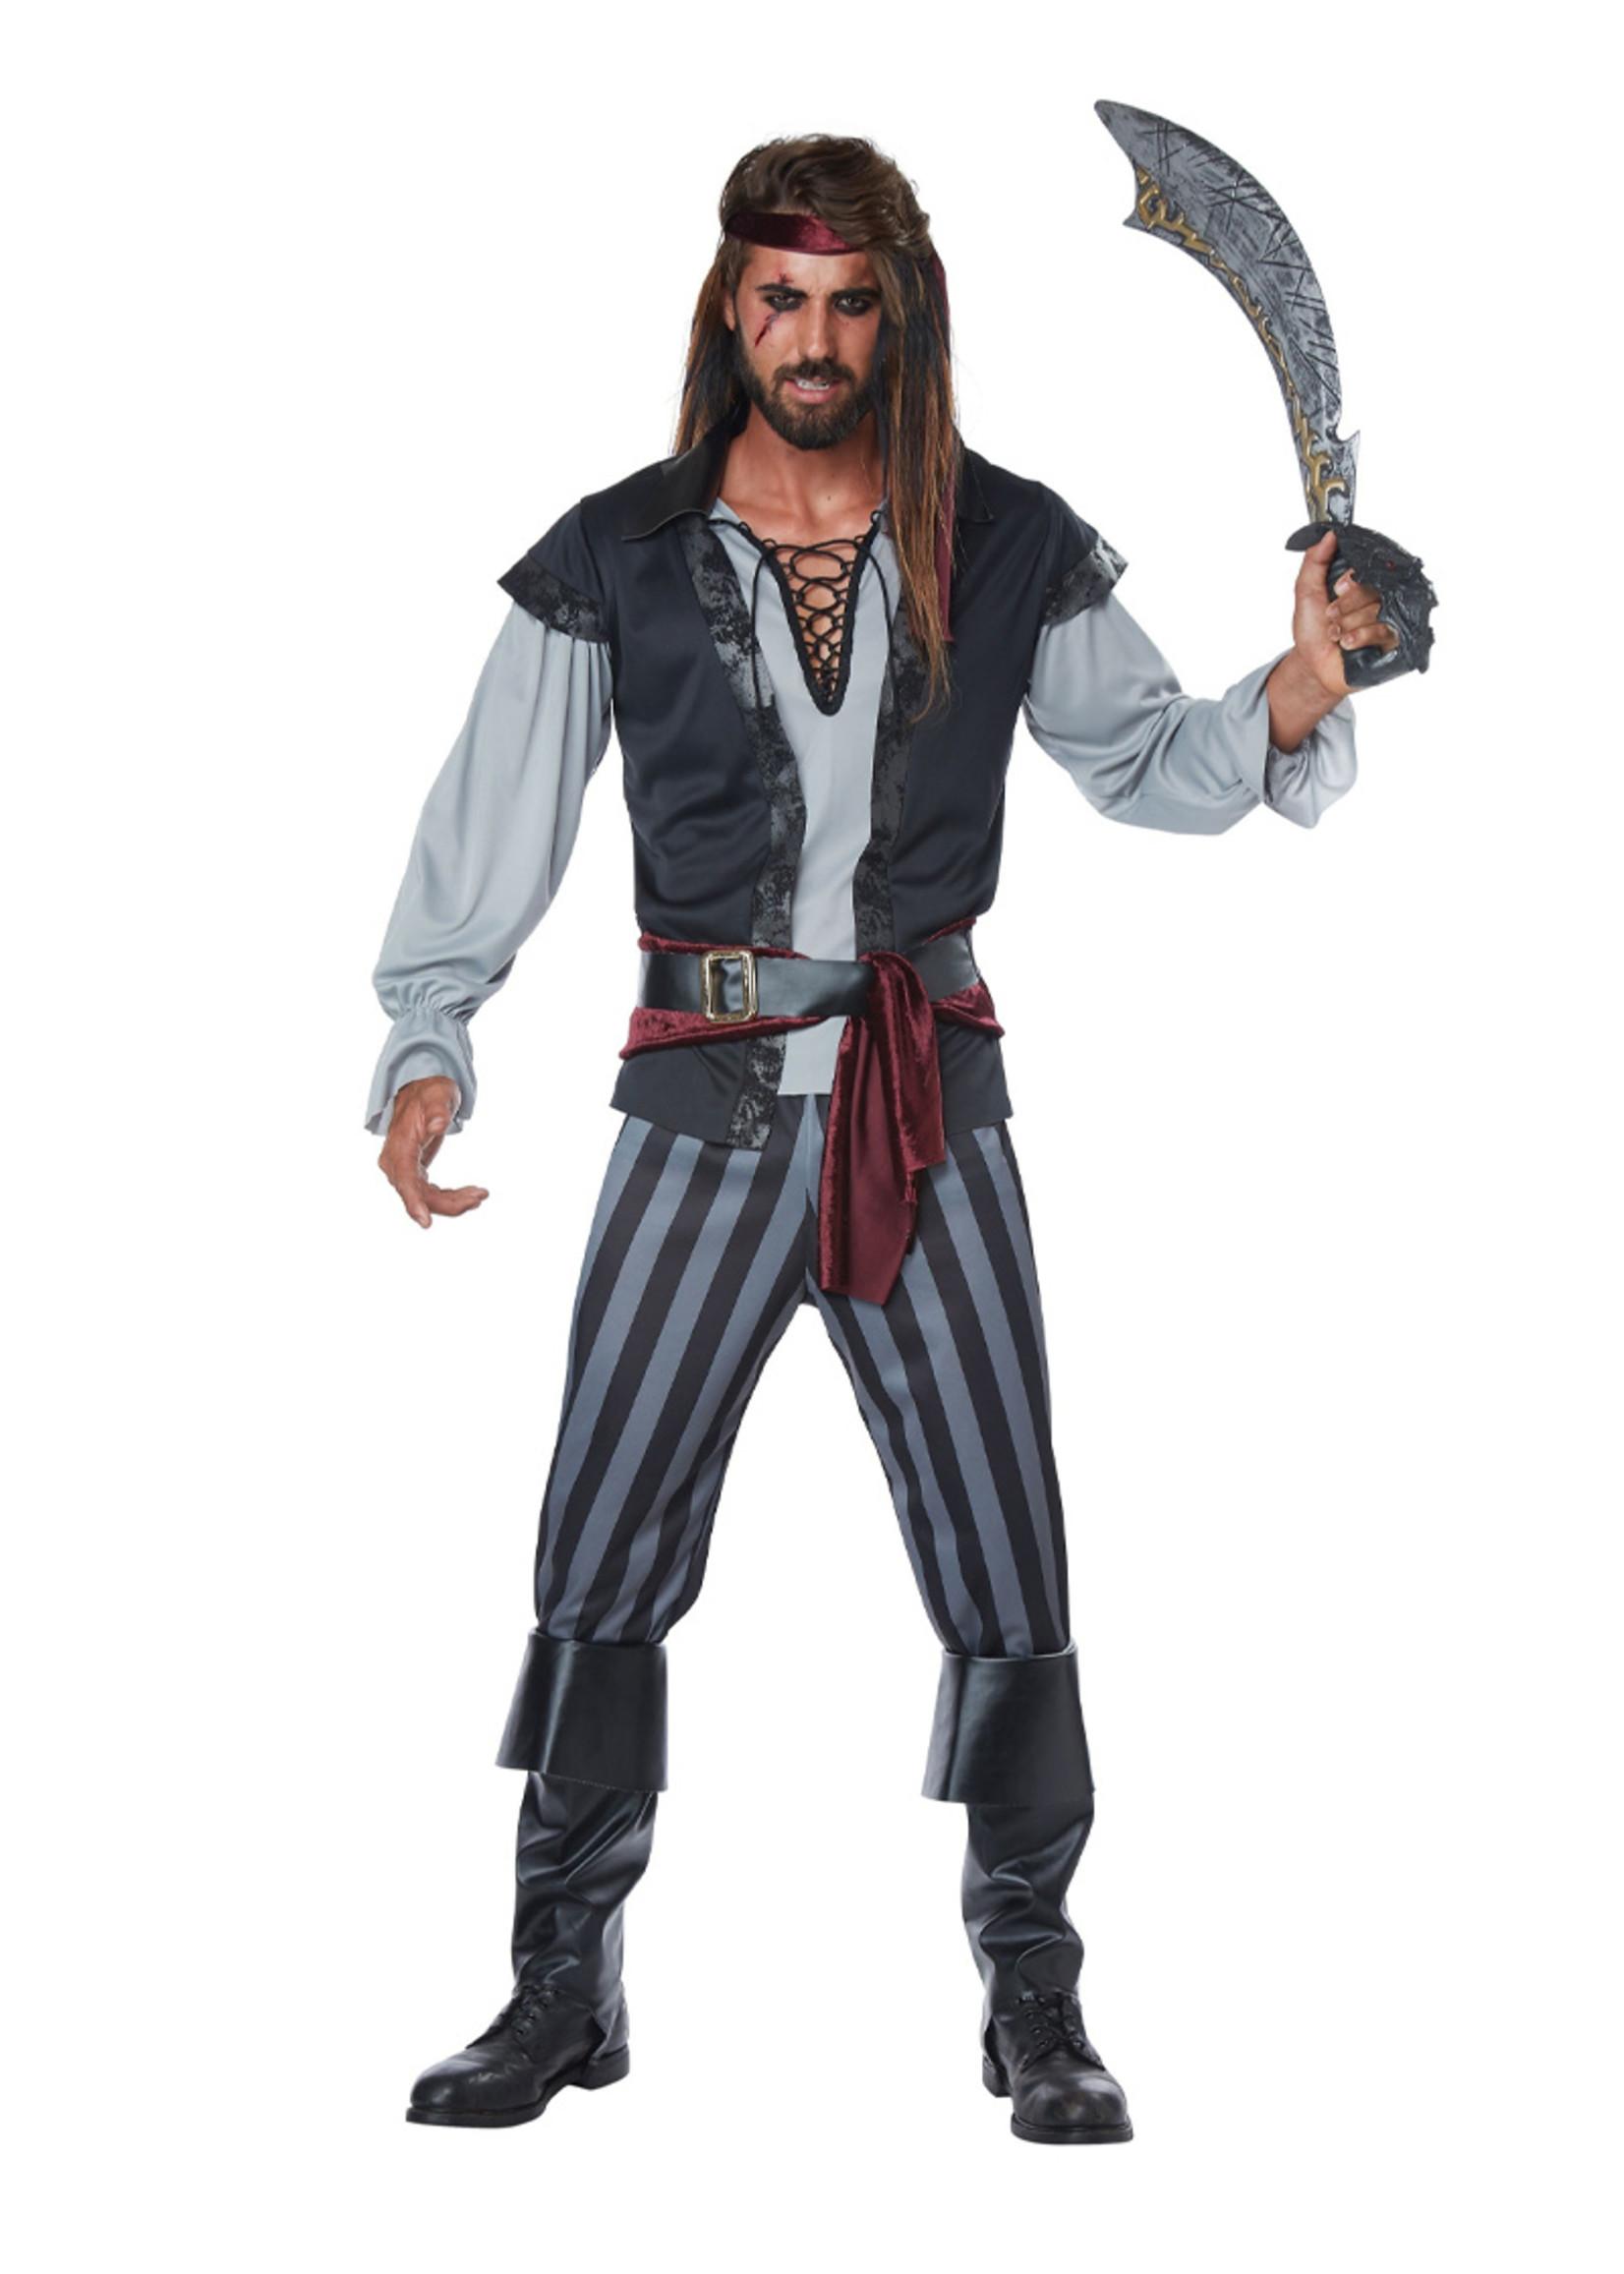 Scallywag Pirate Costume - Men's